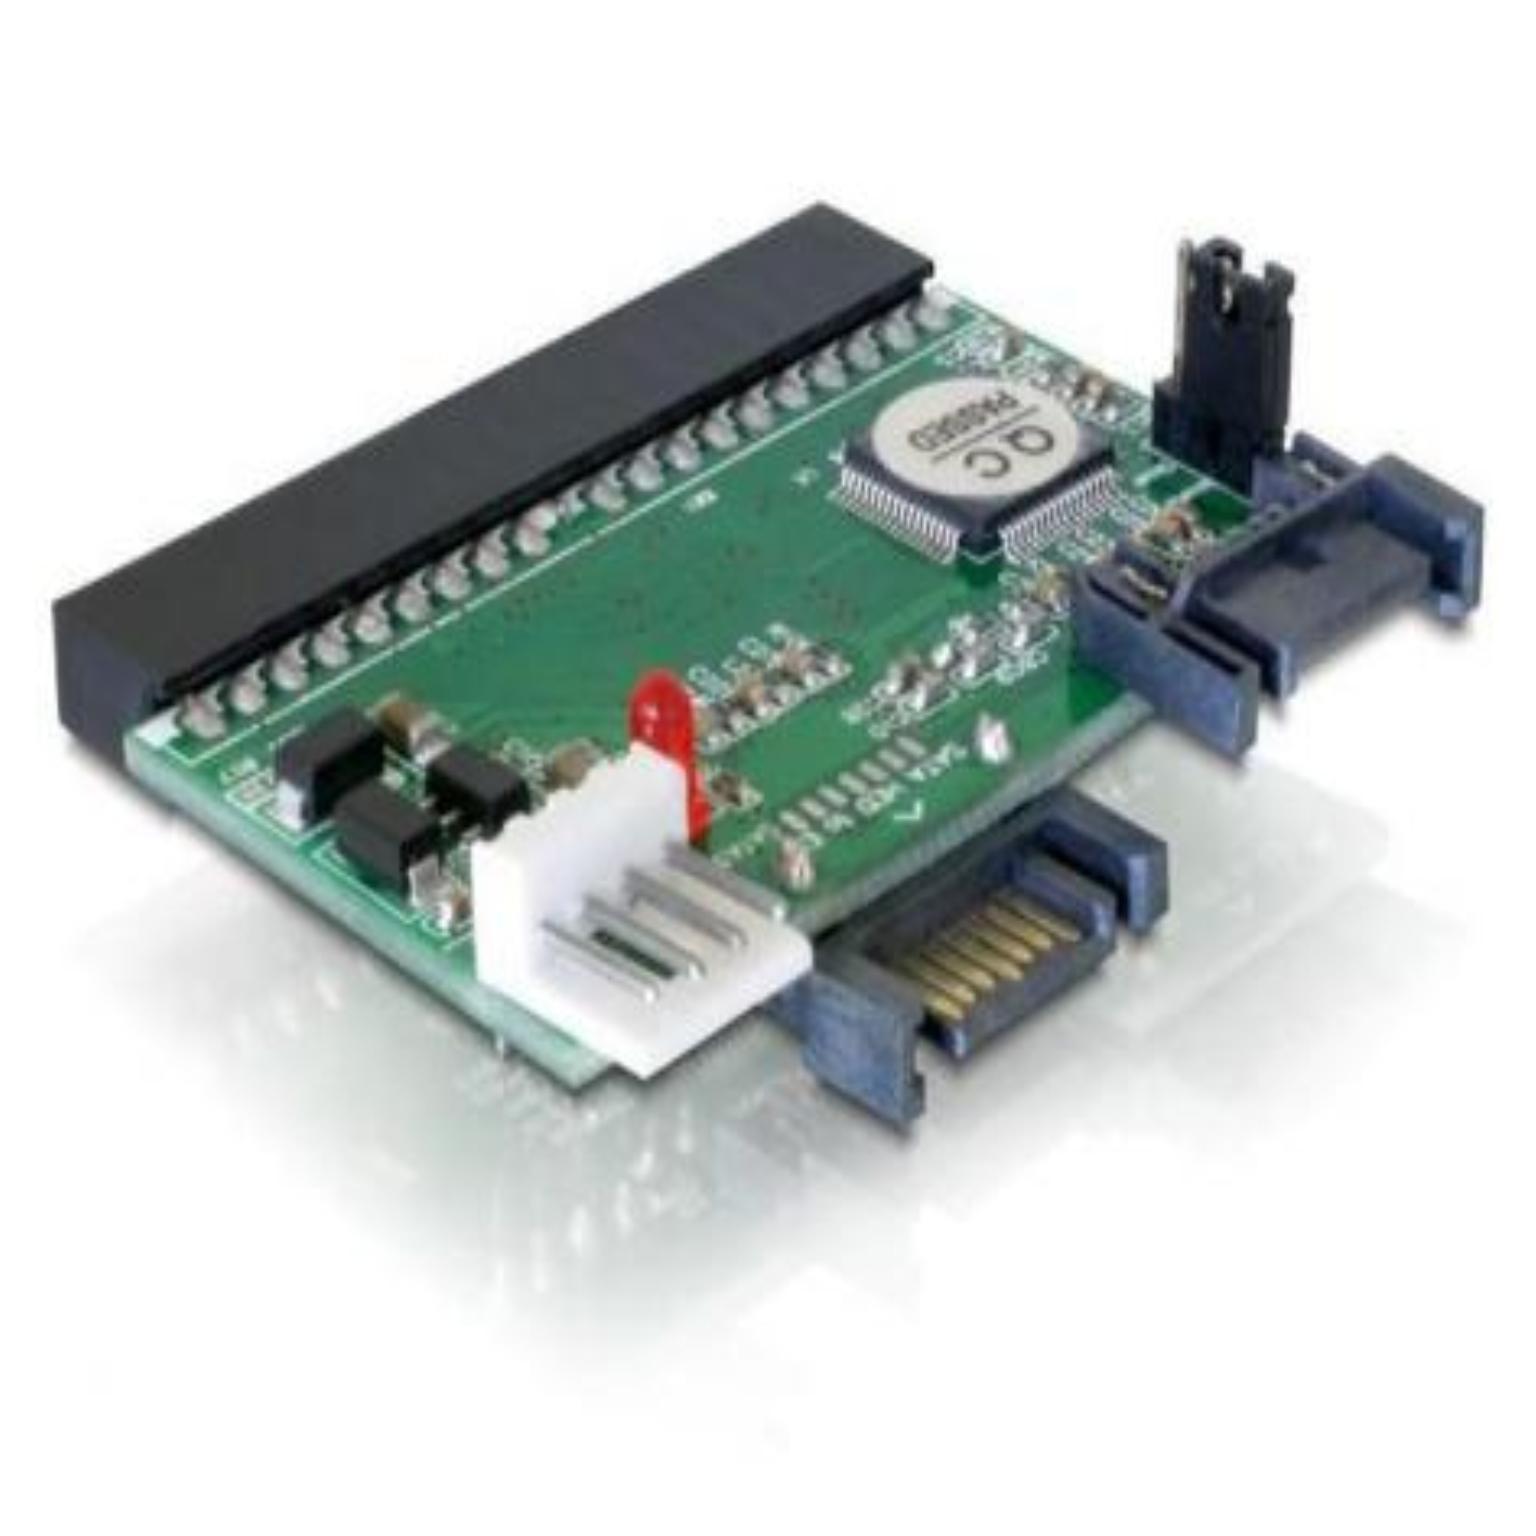 IDE naar SATA converter Géén drivers benodigd